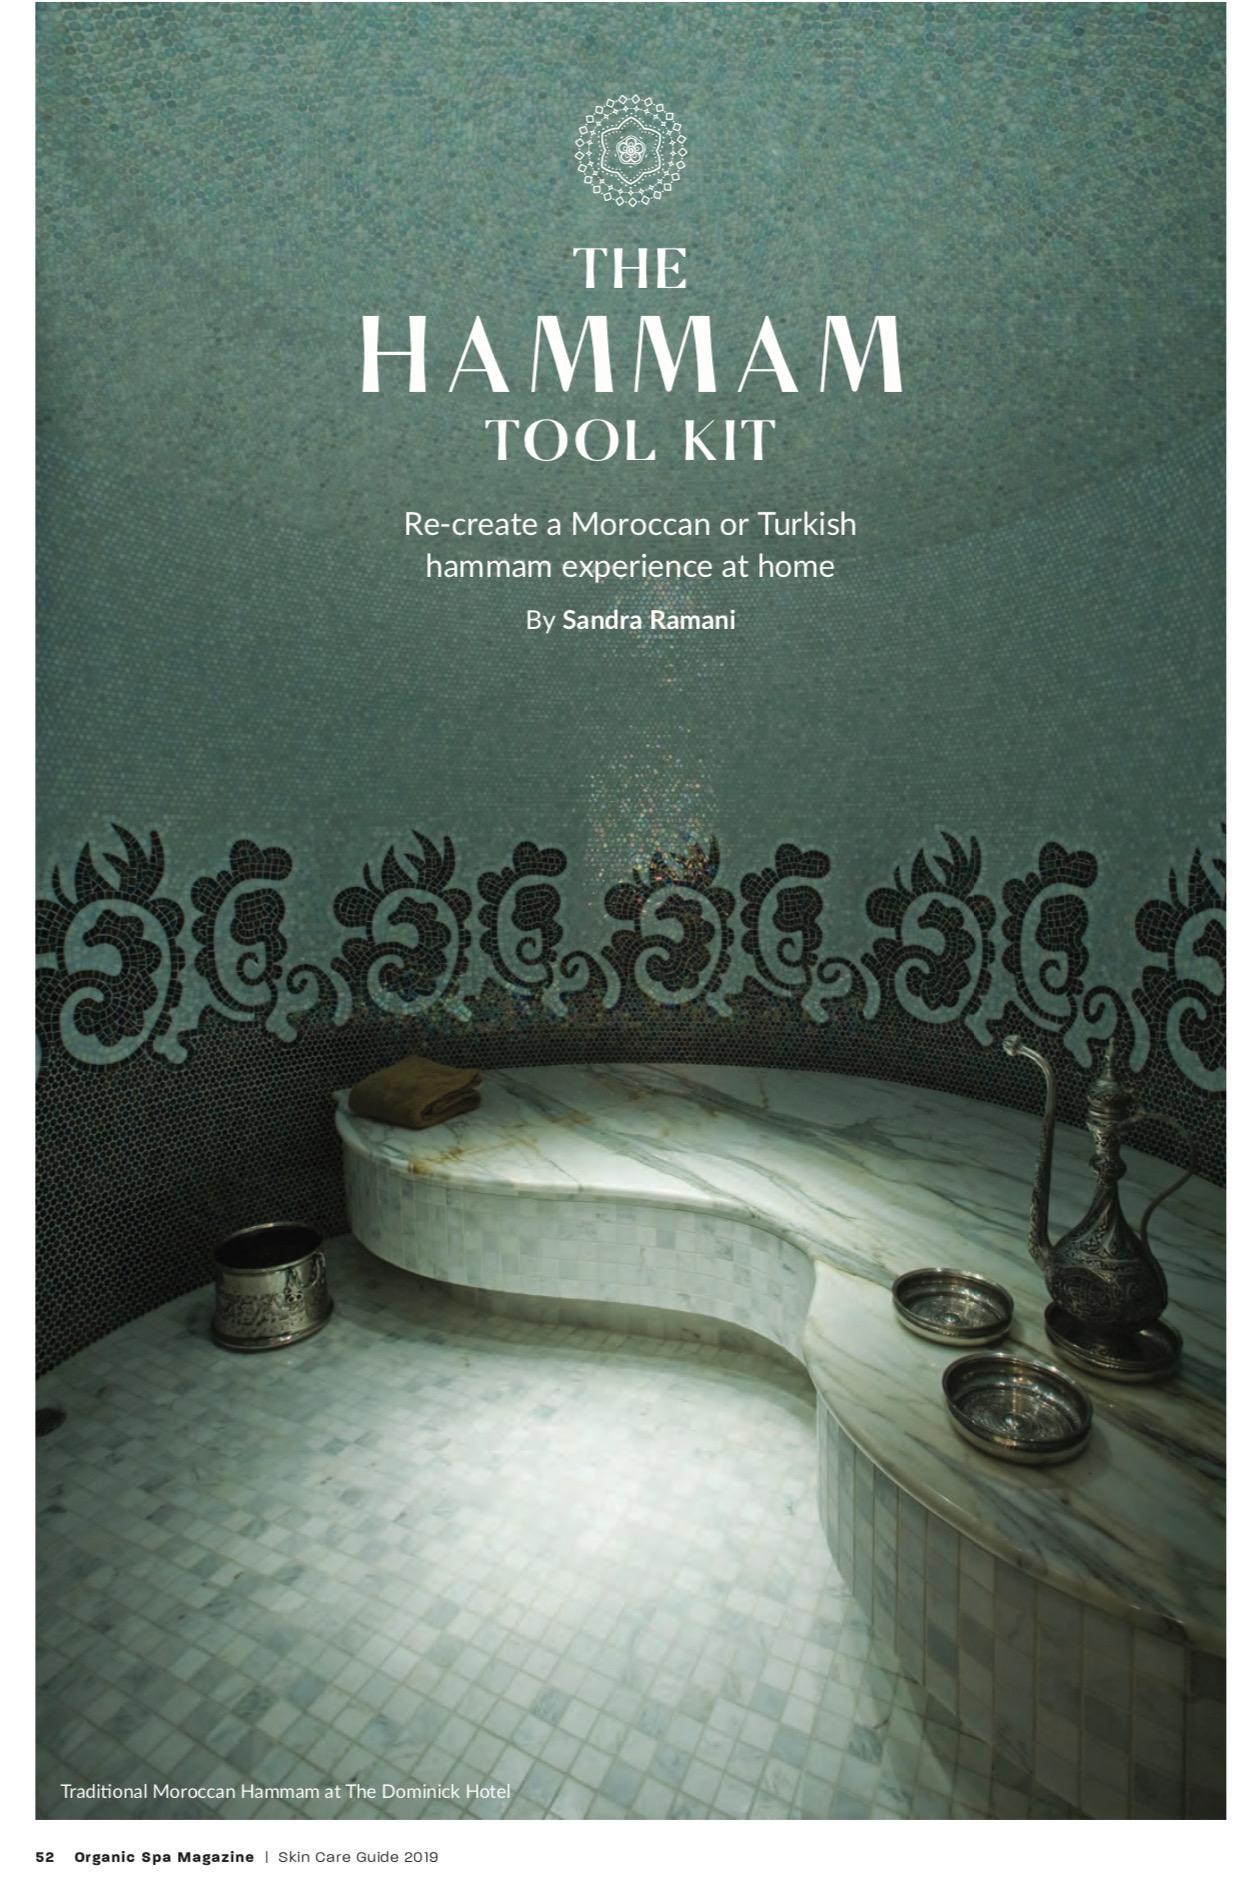 Hammam Tool Kit - Organic SPA Magazine